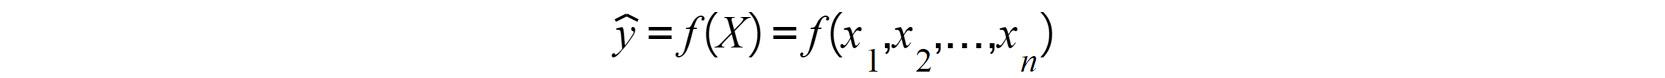 Figure 1.37: Function f(X)